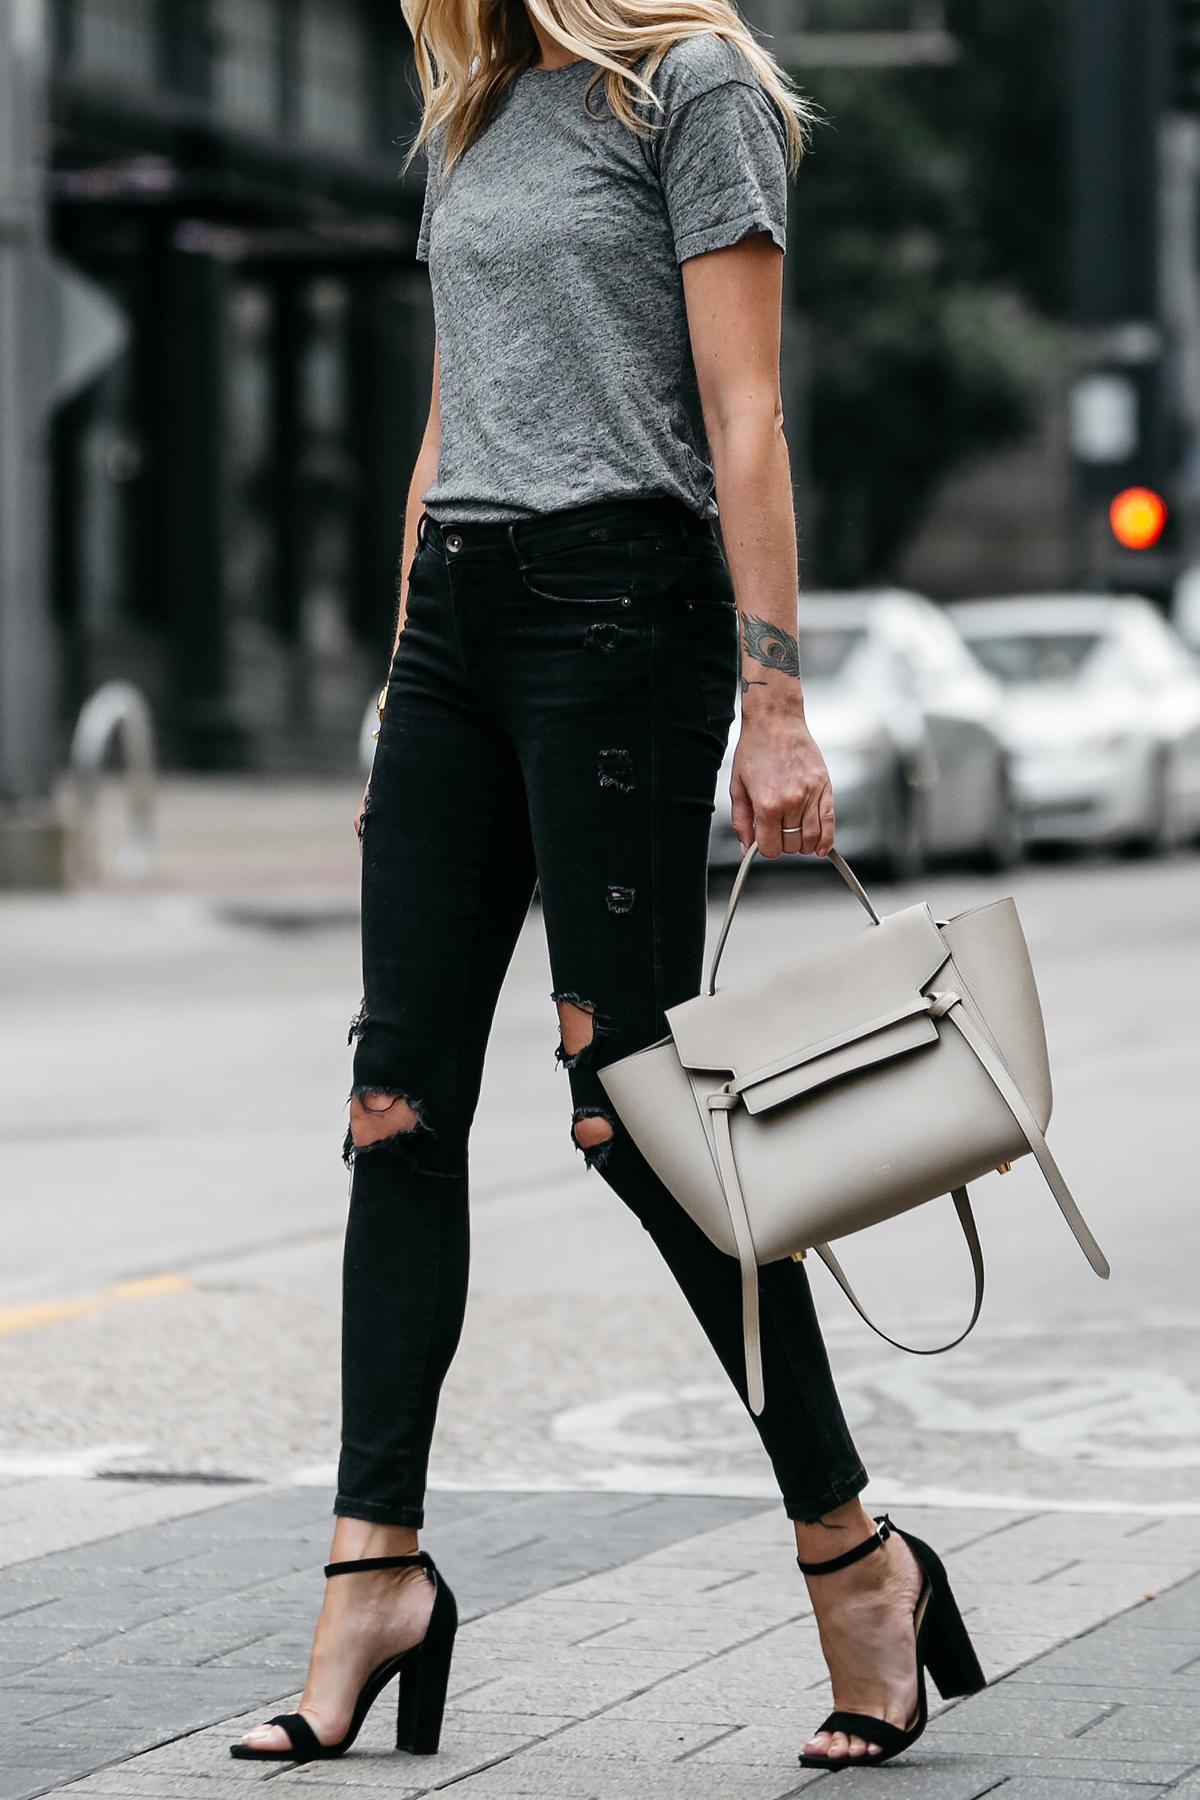 Madewell grey tshirt zara black ripped skinny jeans outfit steve madden black ankle strap heels celine belt bag street style dallas blogger fashion blogger